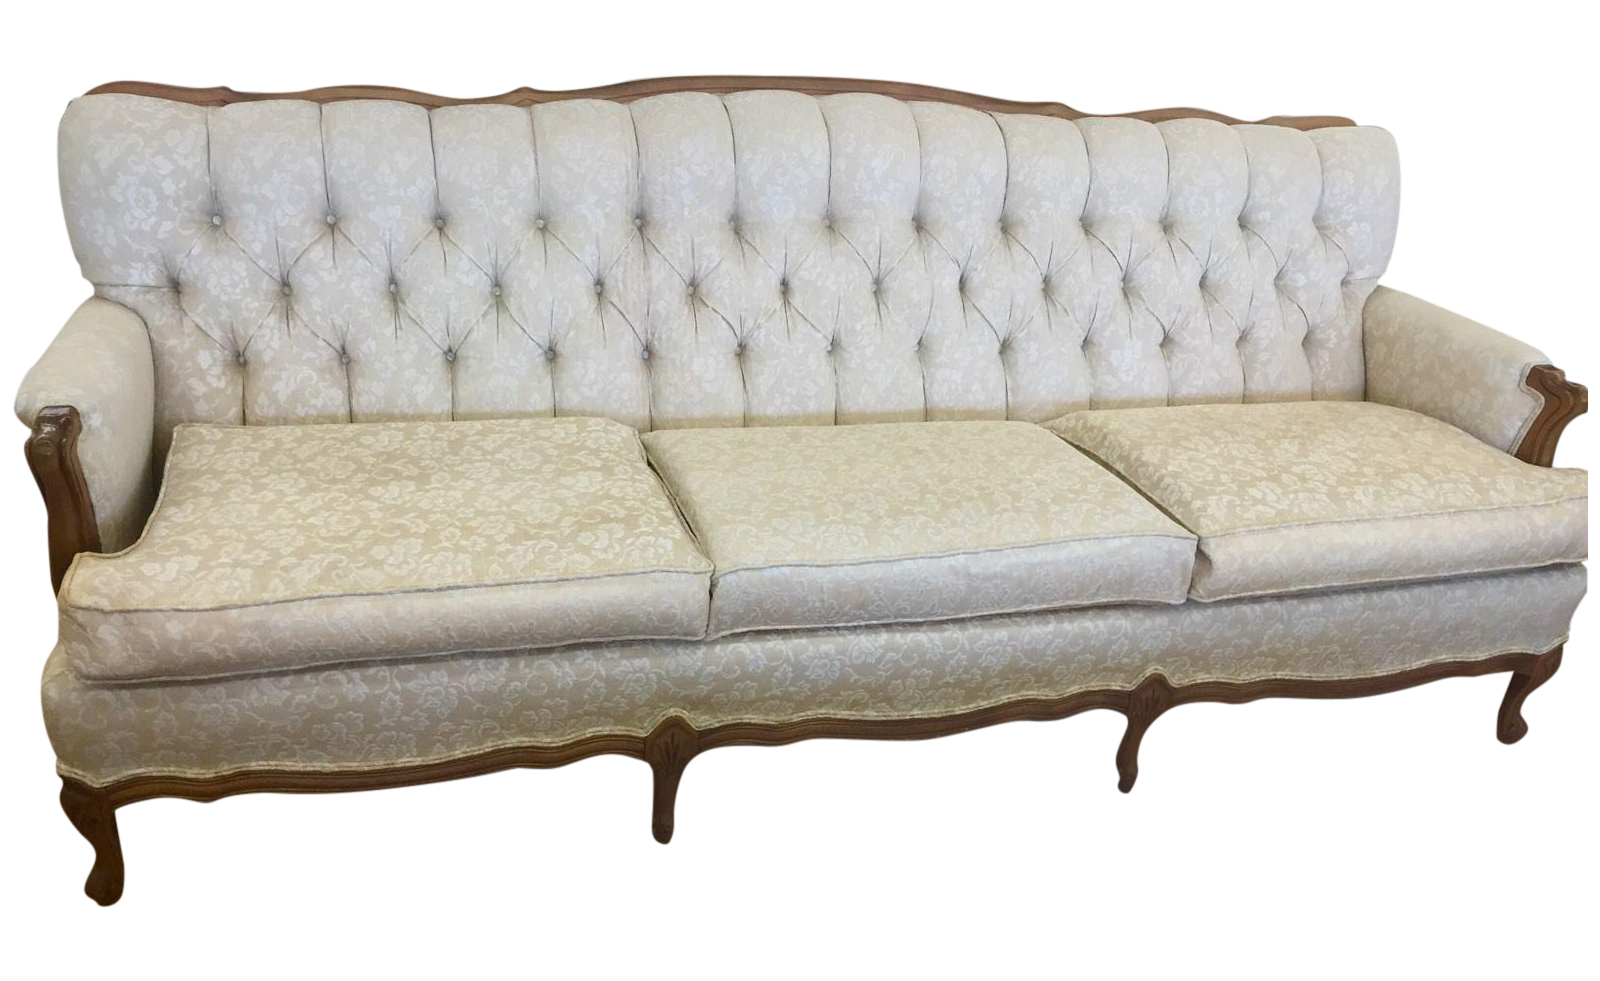 Broyhill French Provincial Sofa